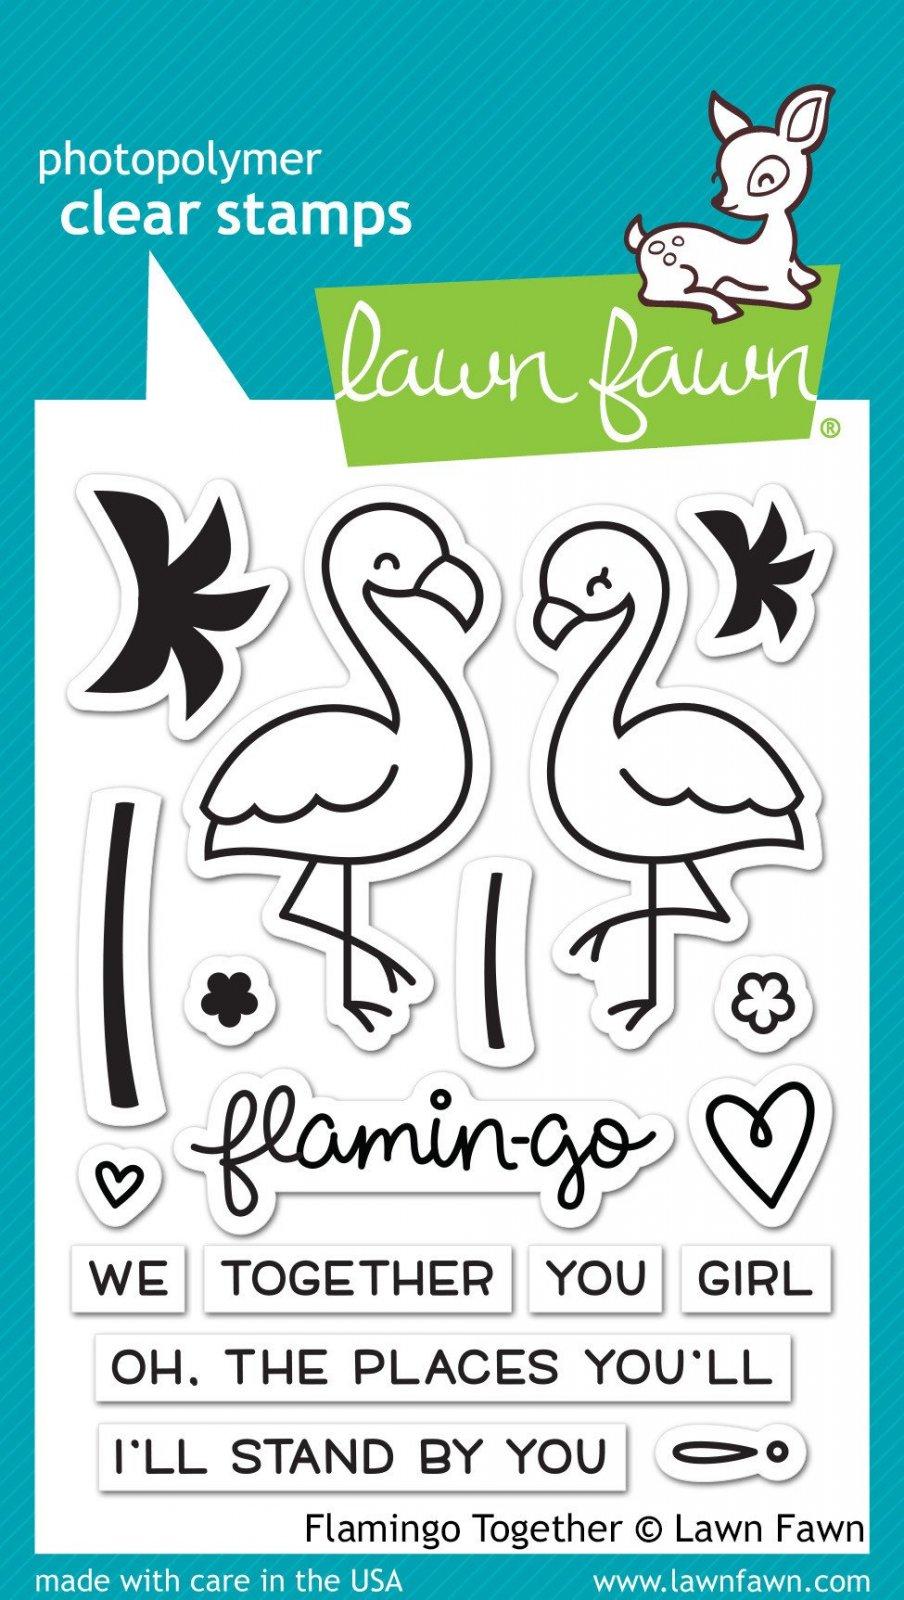 Flamingo Together